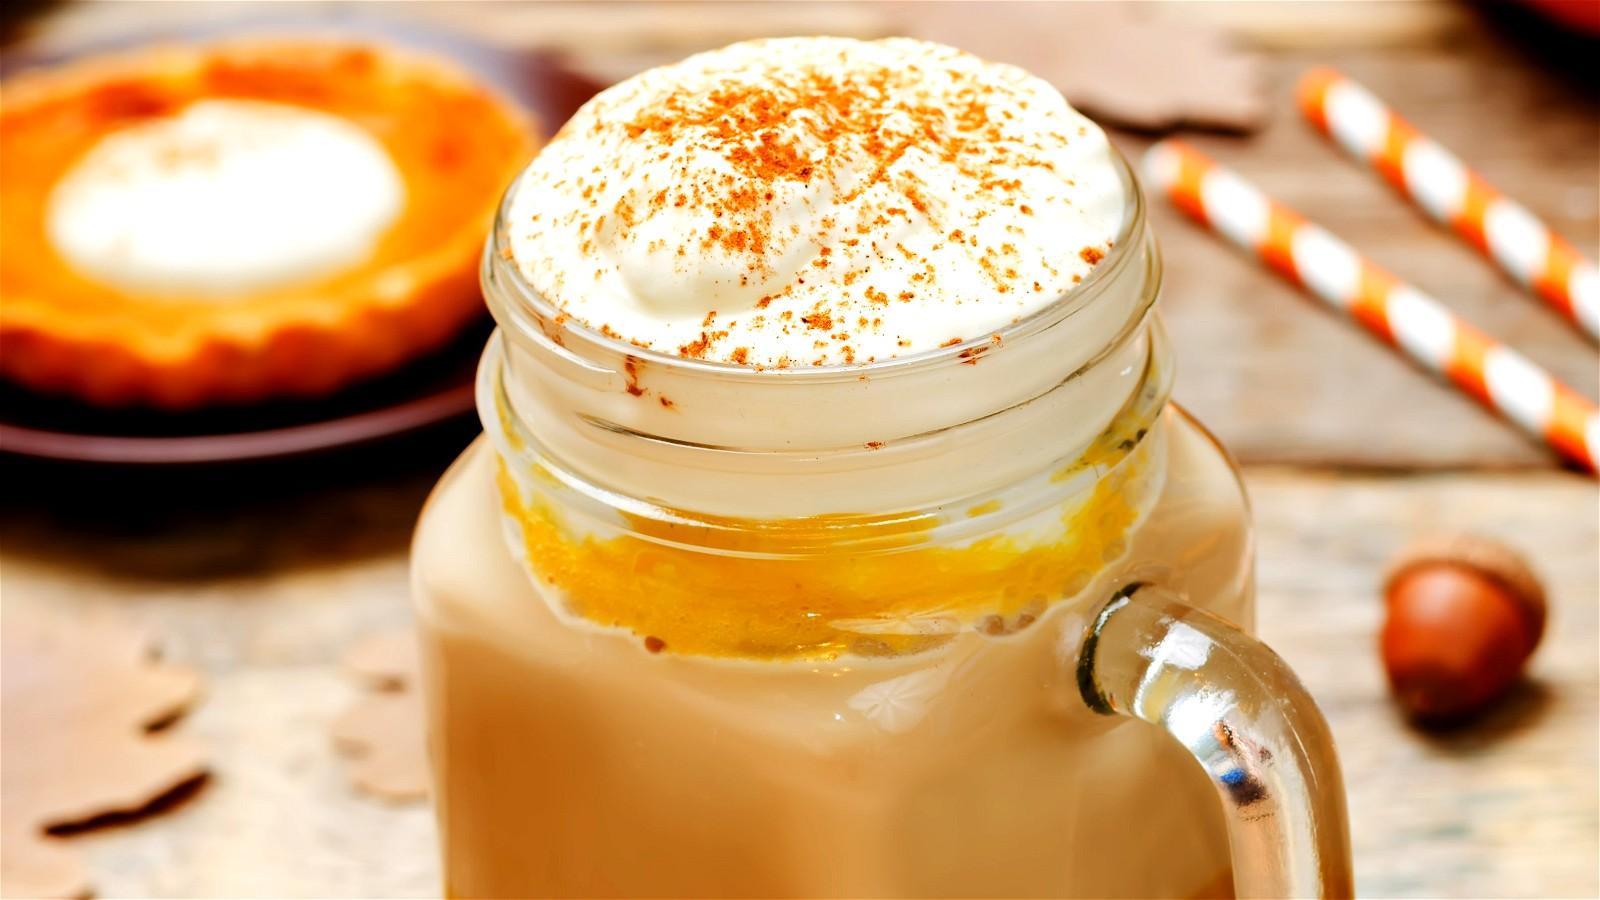 Image of Pumpkin Spice Latte